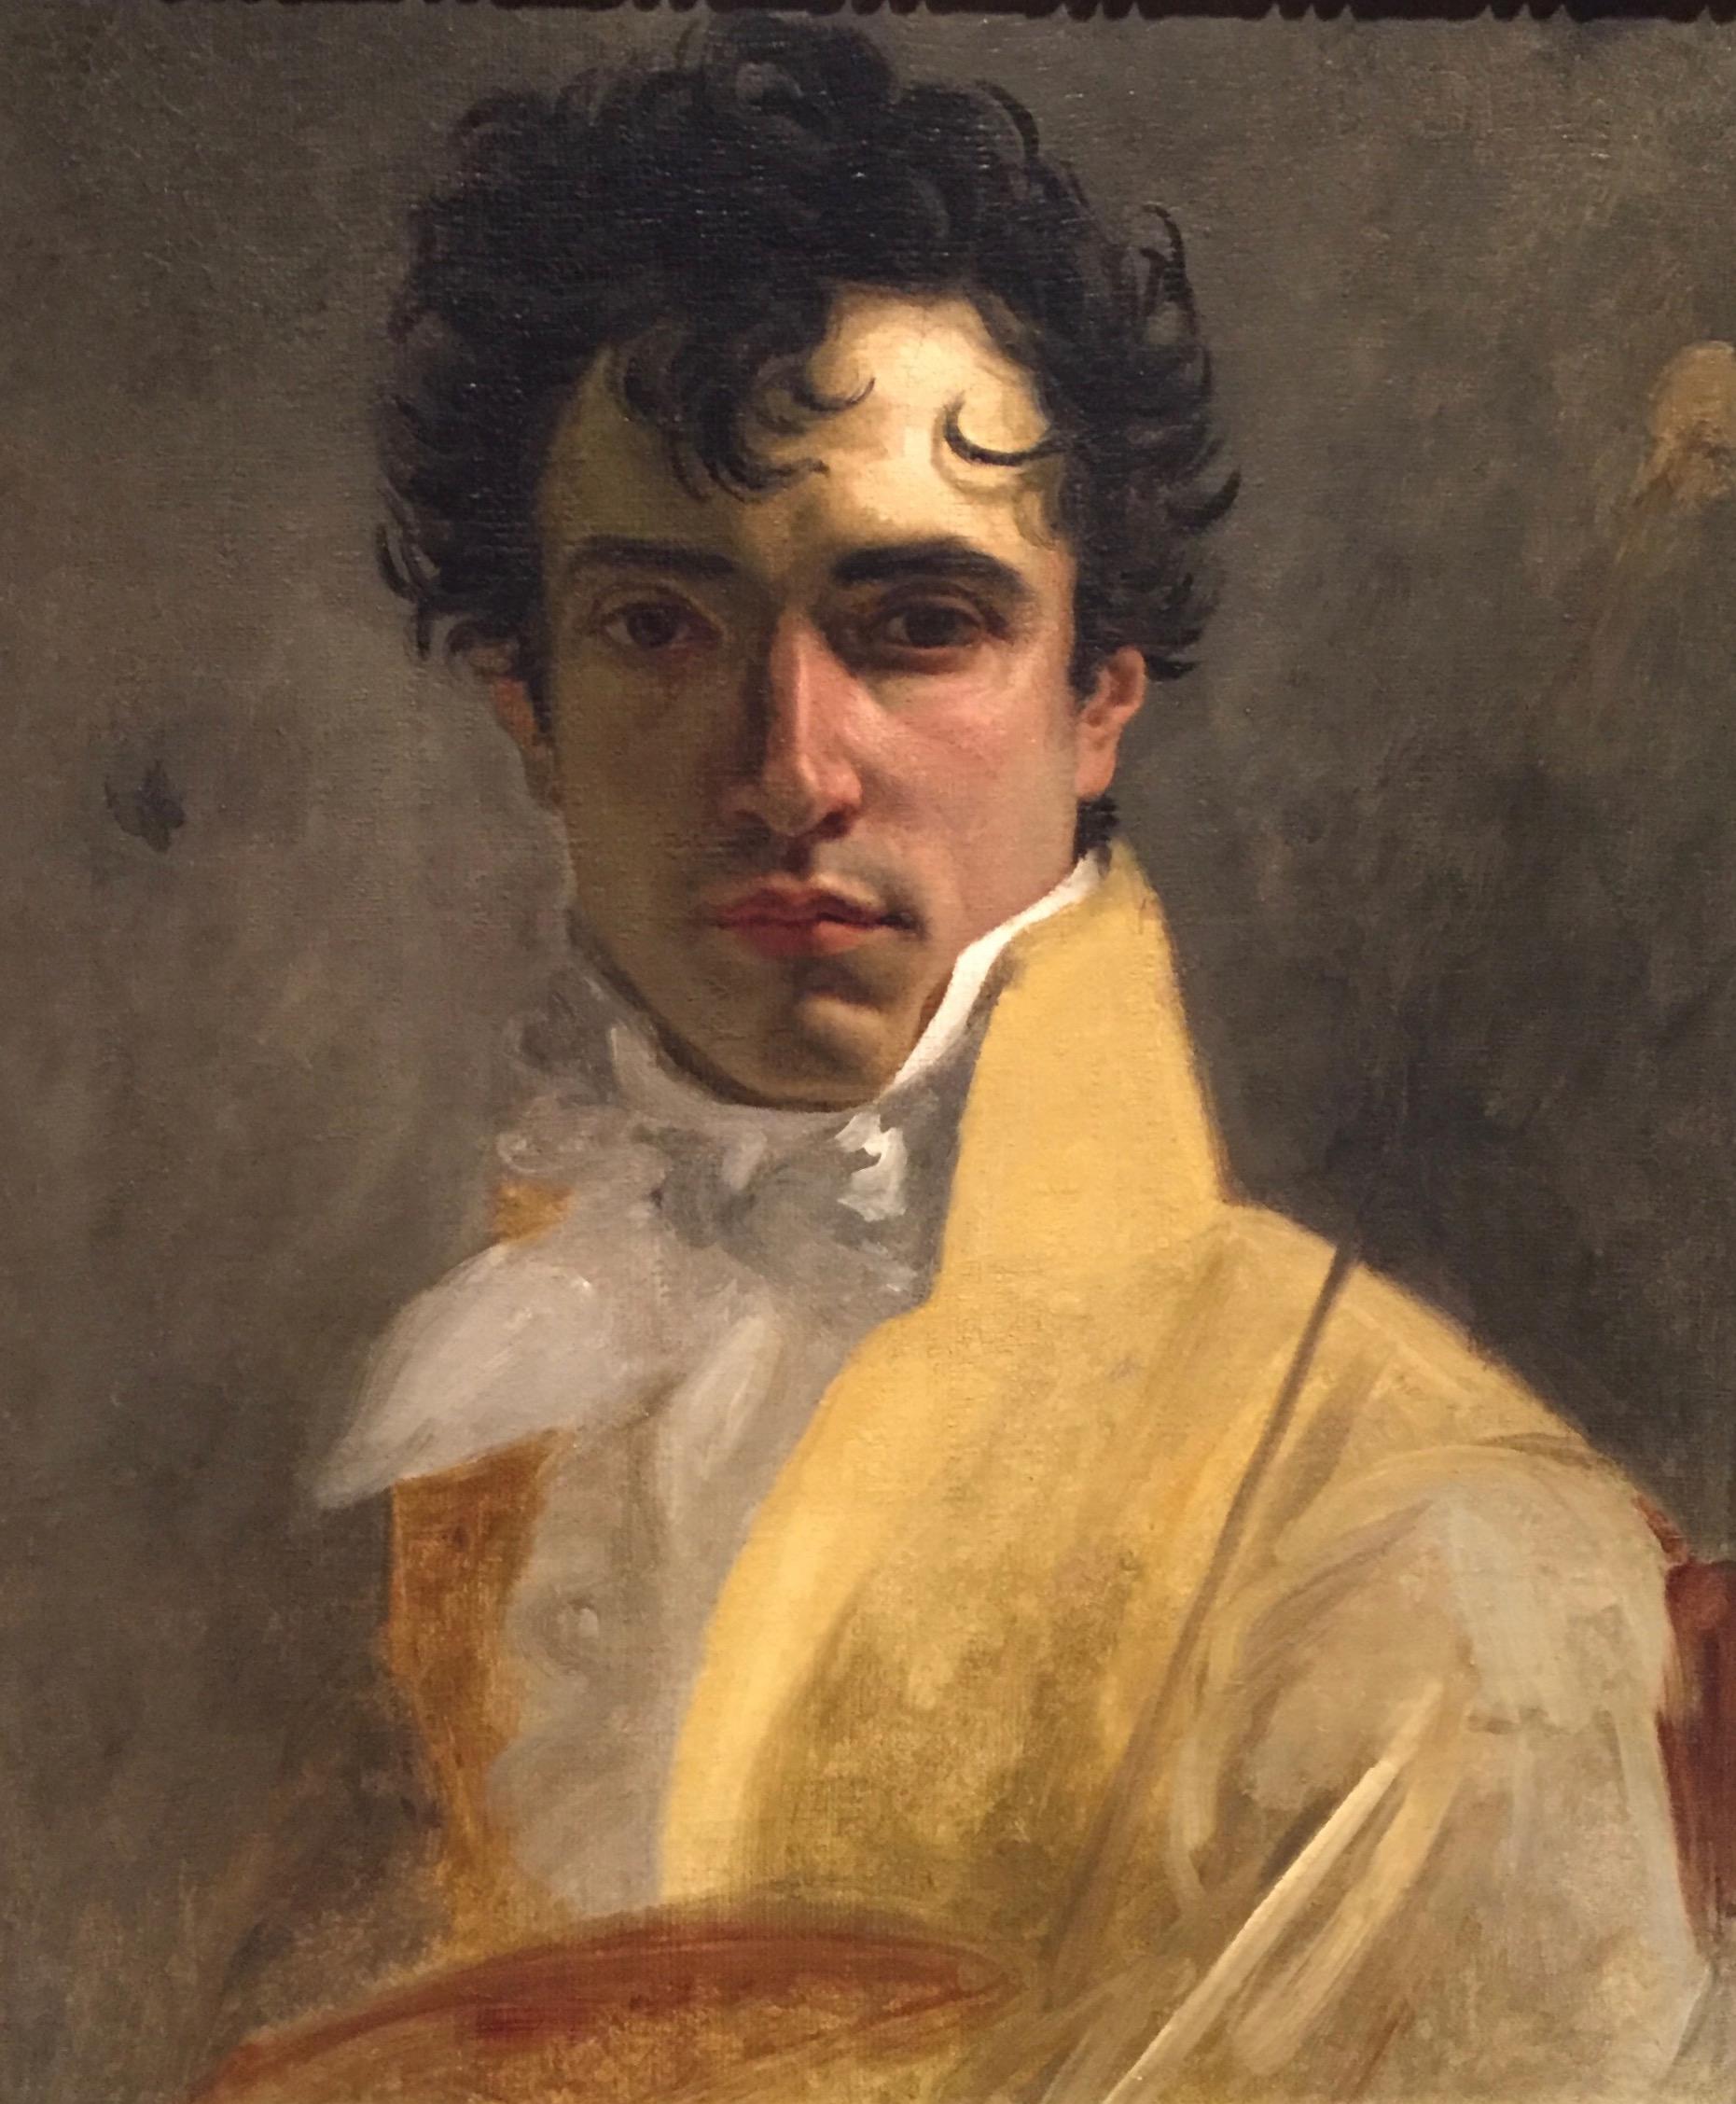 Man In Yellow, 19th Century